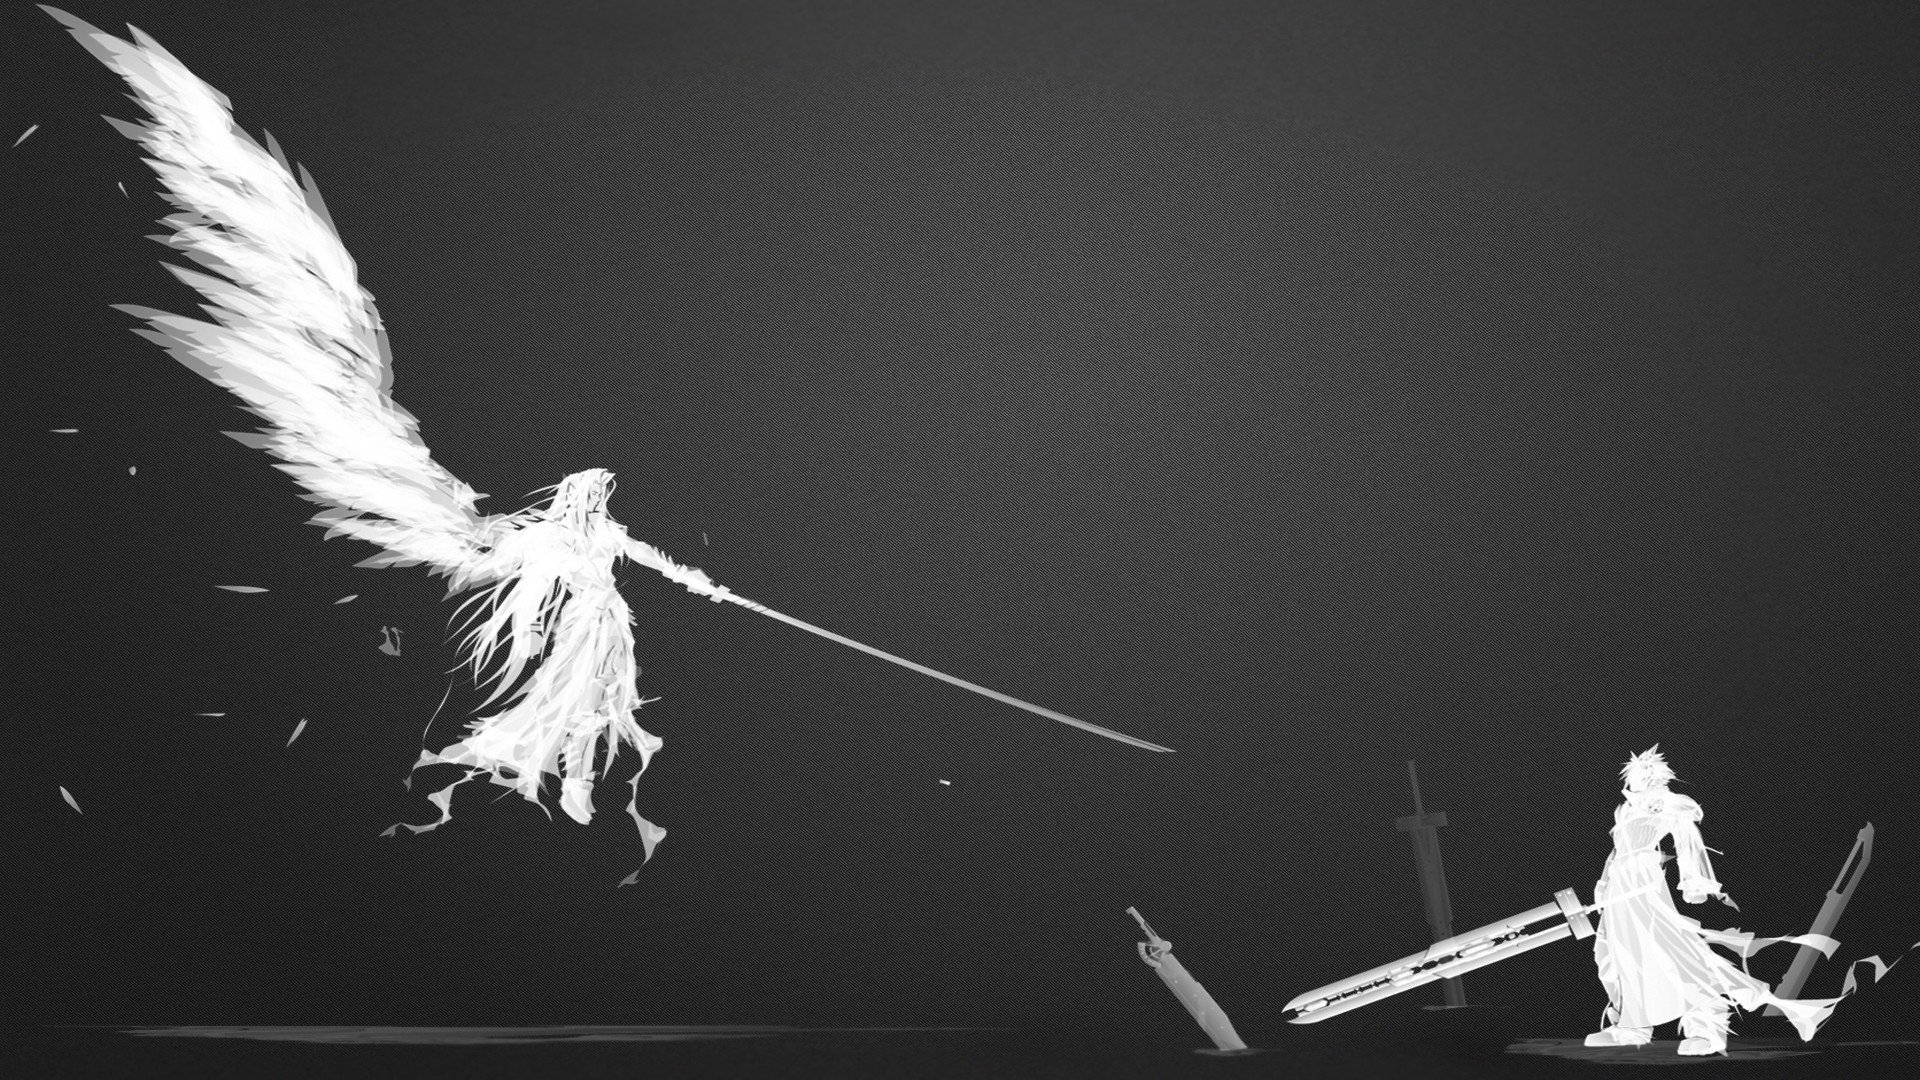 Final Fantasy Vii Sephiroth Cloud Strife Hd Wallpapers